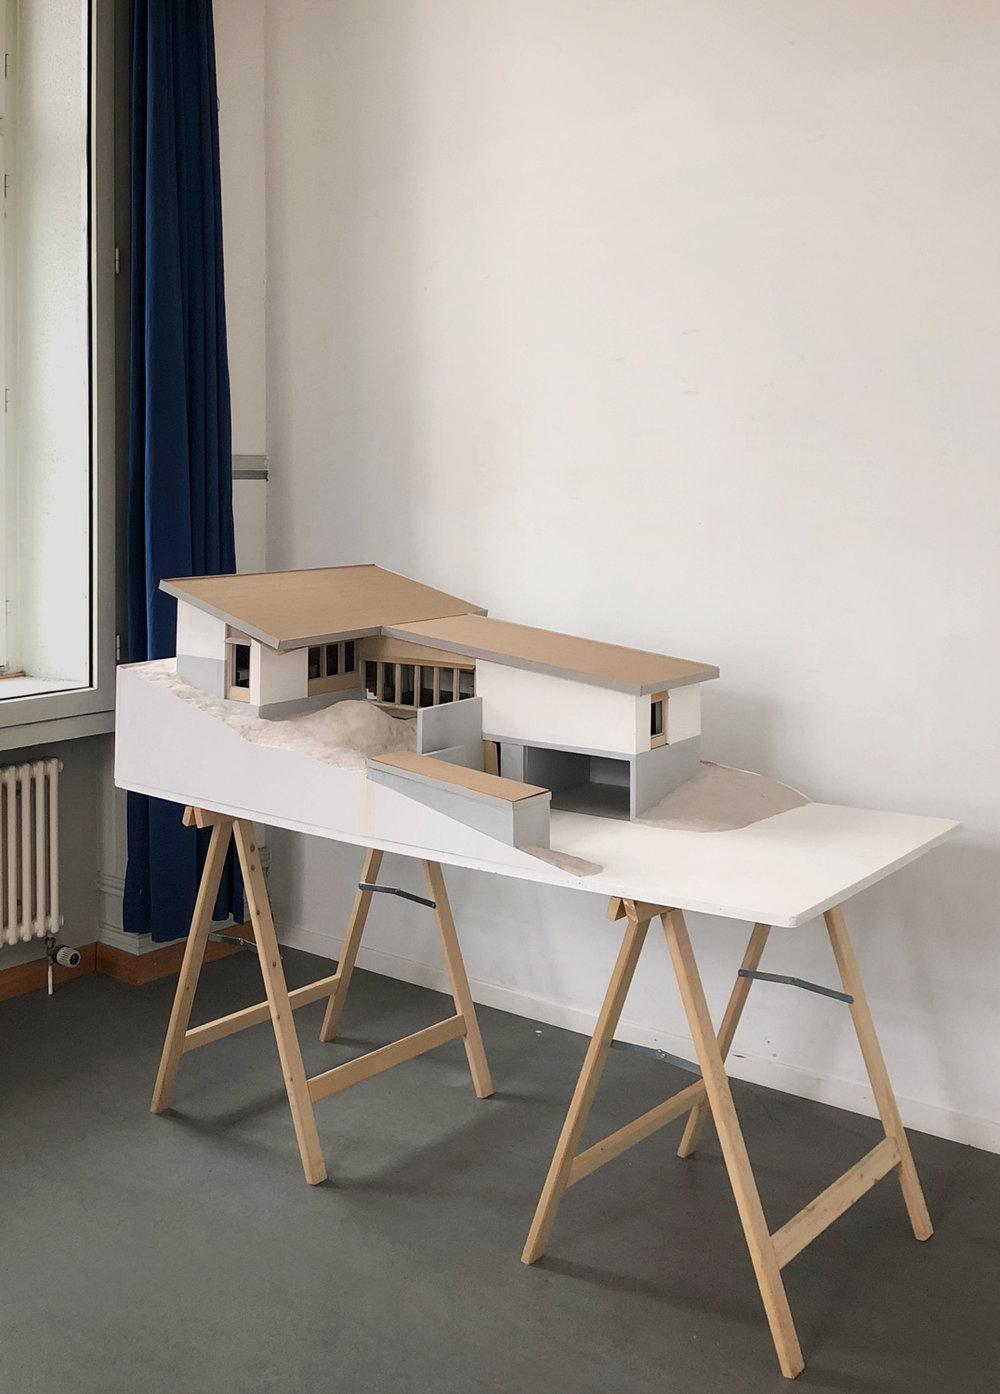 13. Feb 2019 -  Haus am Hang  - Modell 1:20